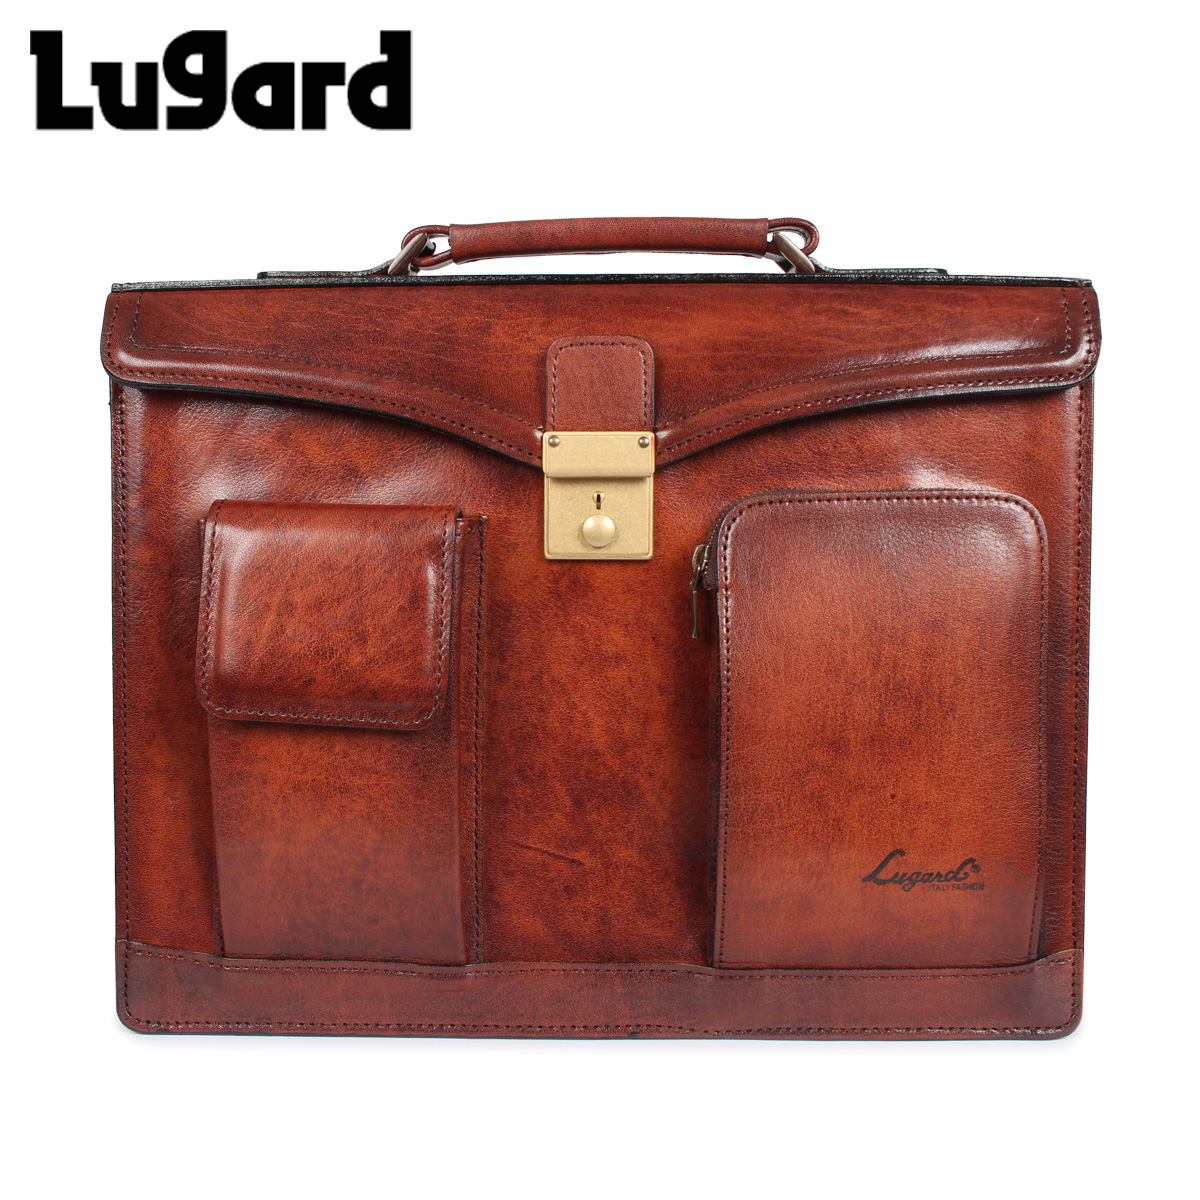 Lugard ラガード 青木鞄 バッグ ビジネスバッグ ブリーフケース G3 BUSINESS BAG メンズ ジースリー 2WAY ブラウン 5222